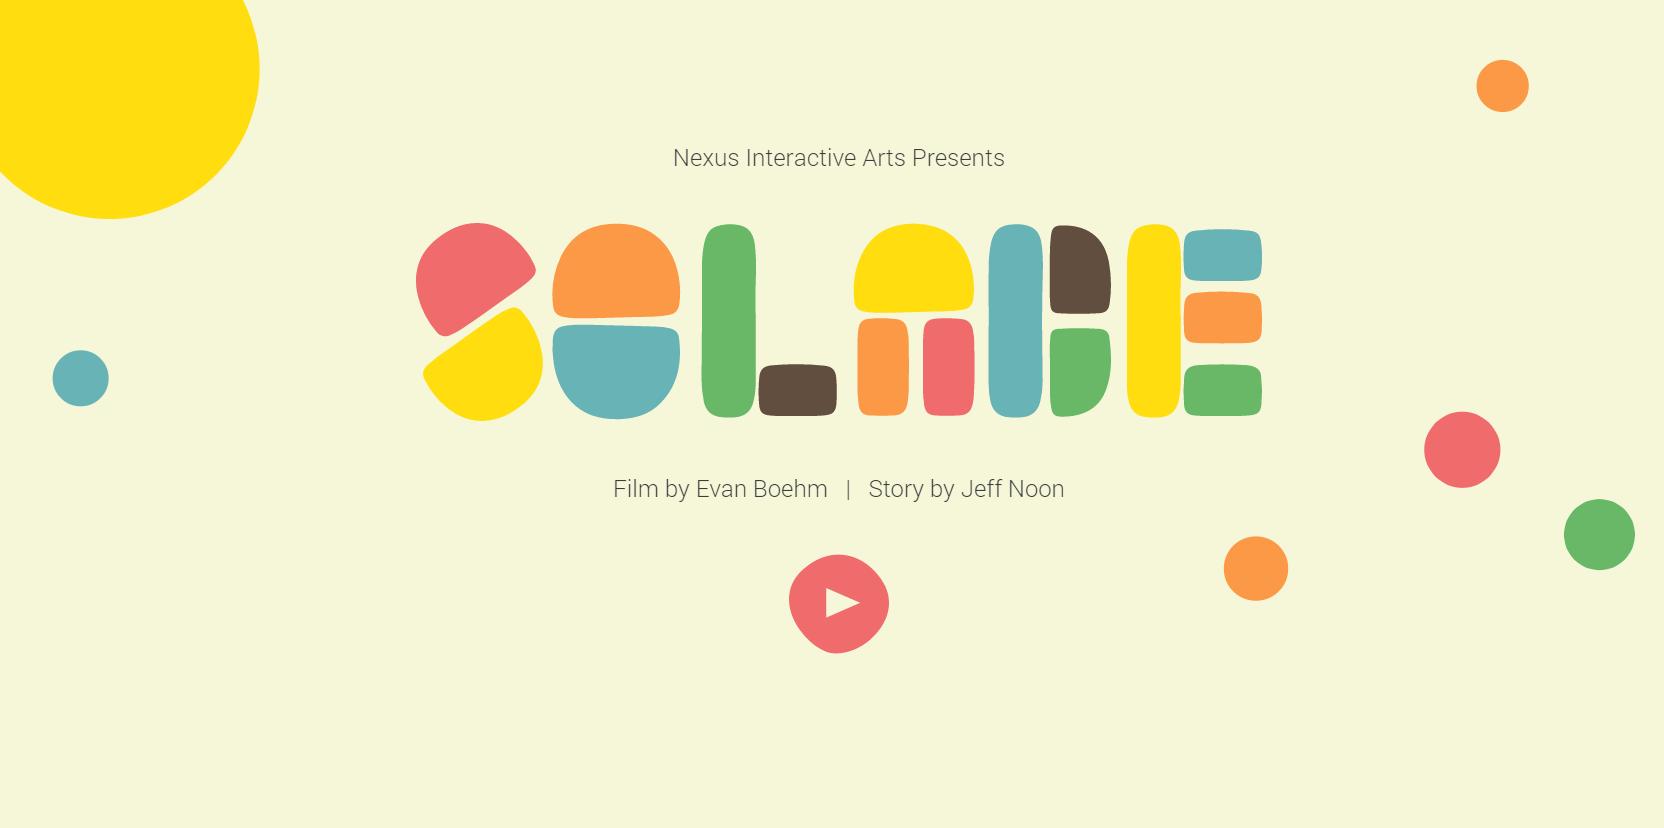 Nexus' Evan Boehm Creates Captivating Interactive Film 'Solace'